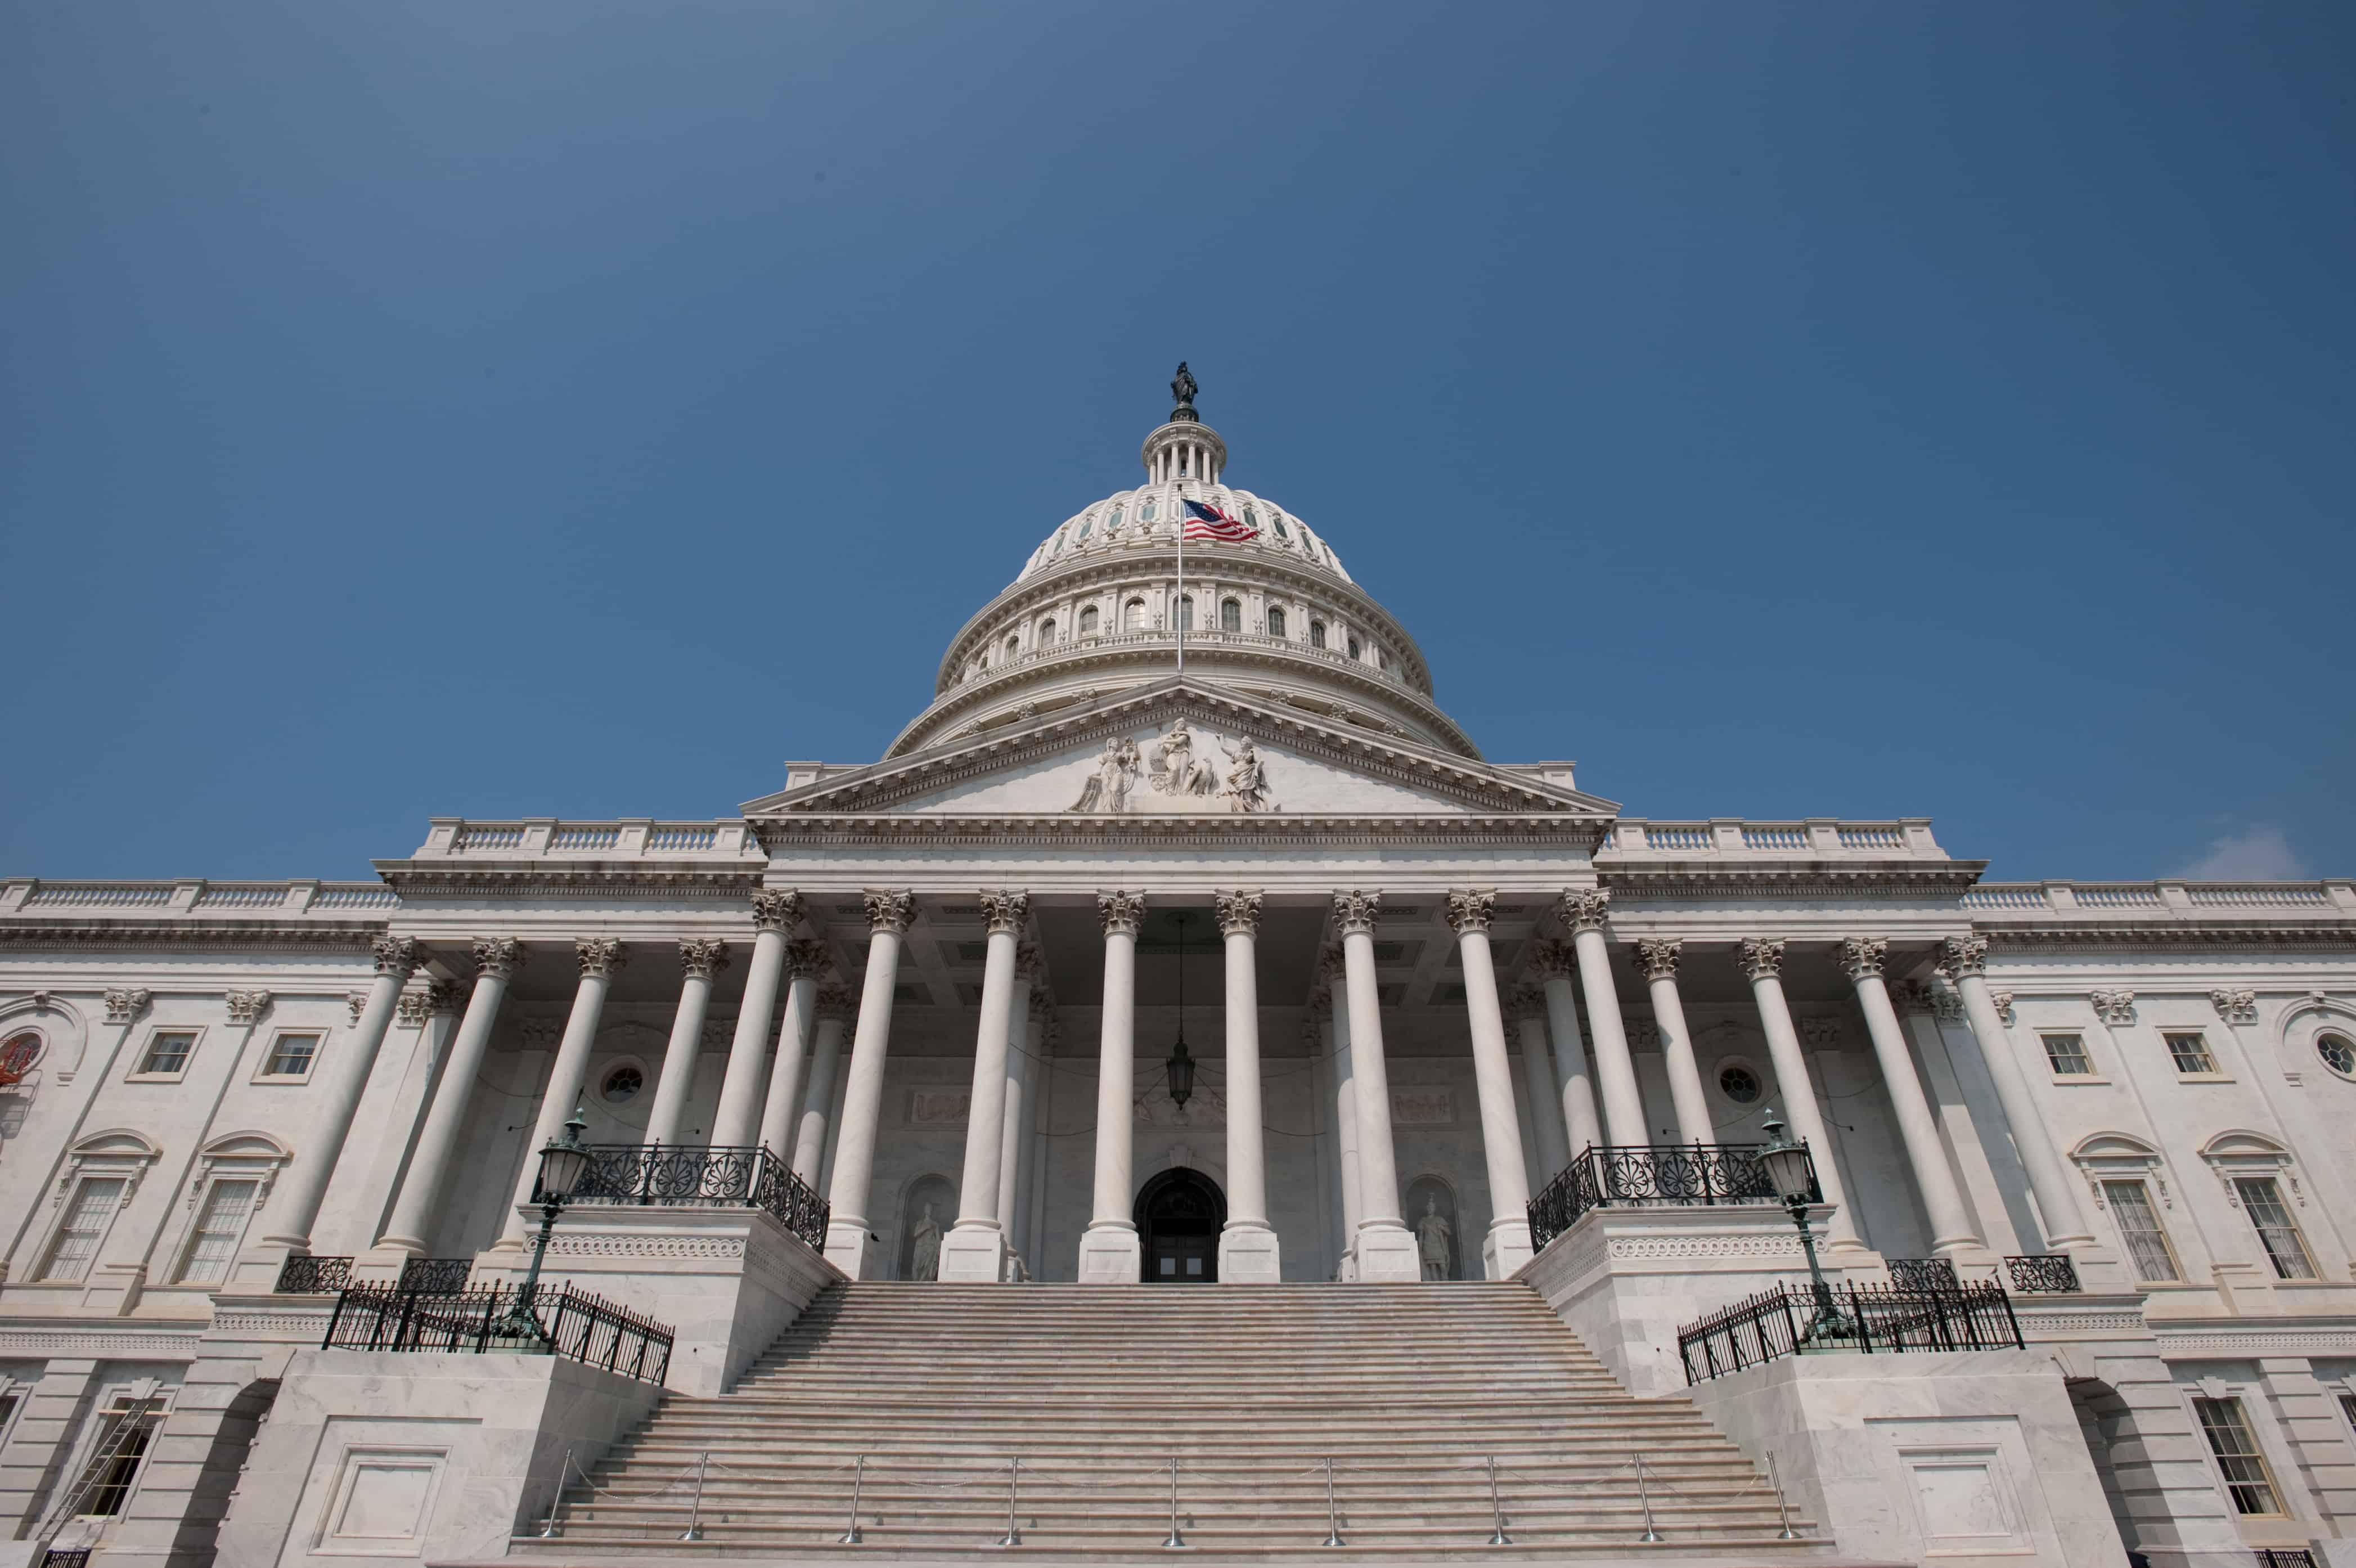 Bakkt To The Senate: CEO Kelly Loeffler To Occupy US Senate Seat